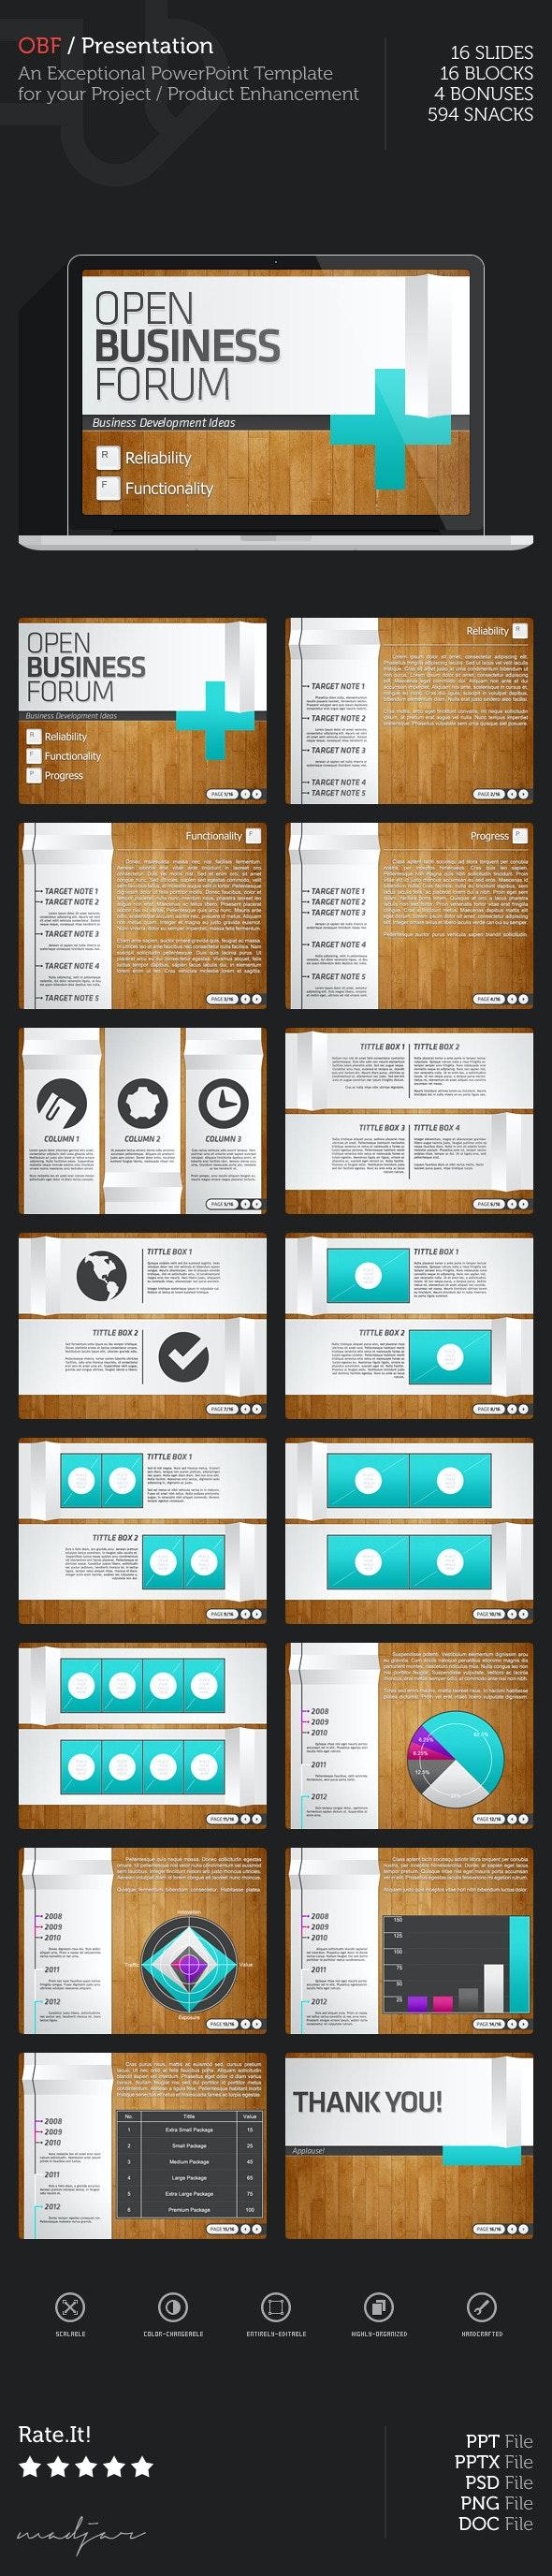 Open Business Forum PowerPoint Presentation - PowerPoint Templates Presentation Templates